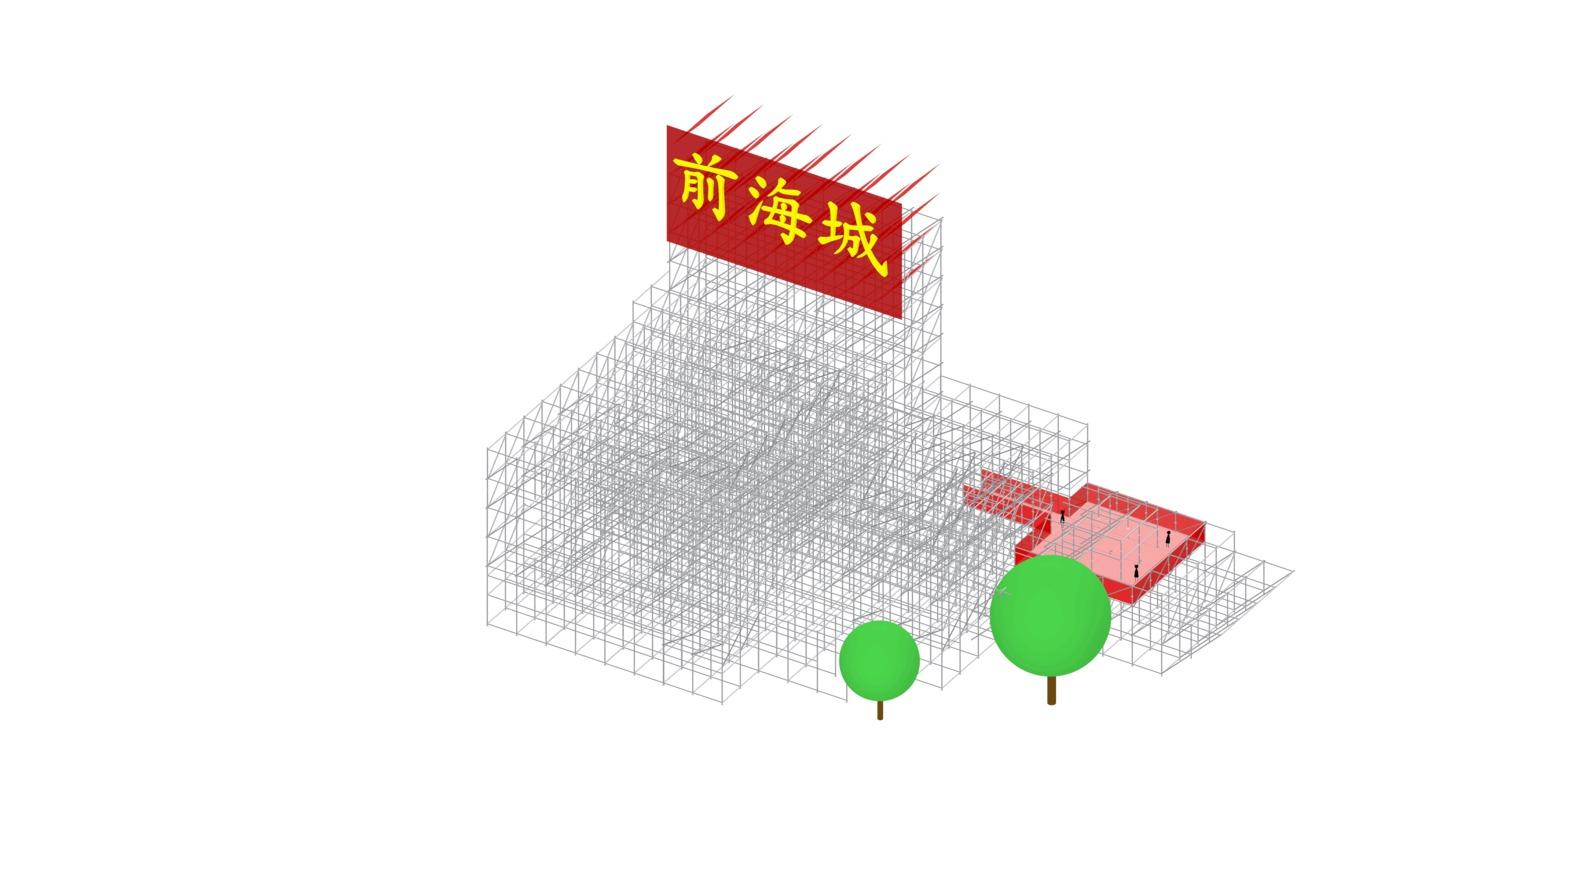 http://img.zhux2.com/editor1623387712490675.jpg